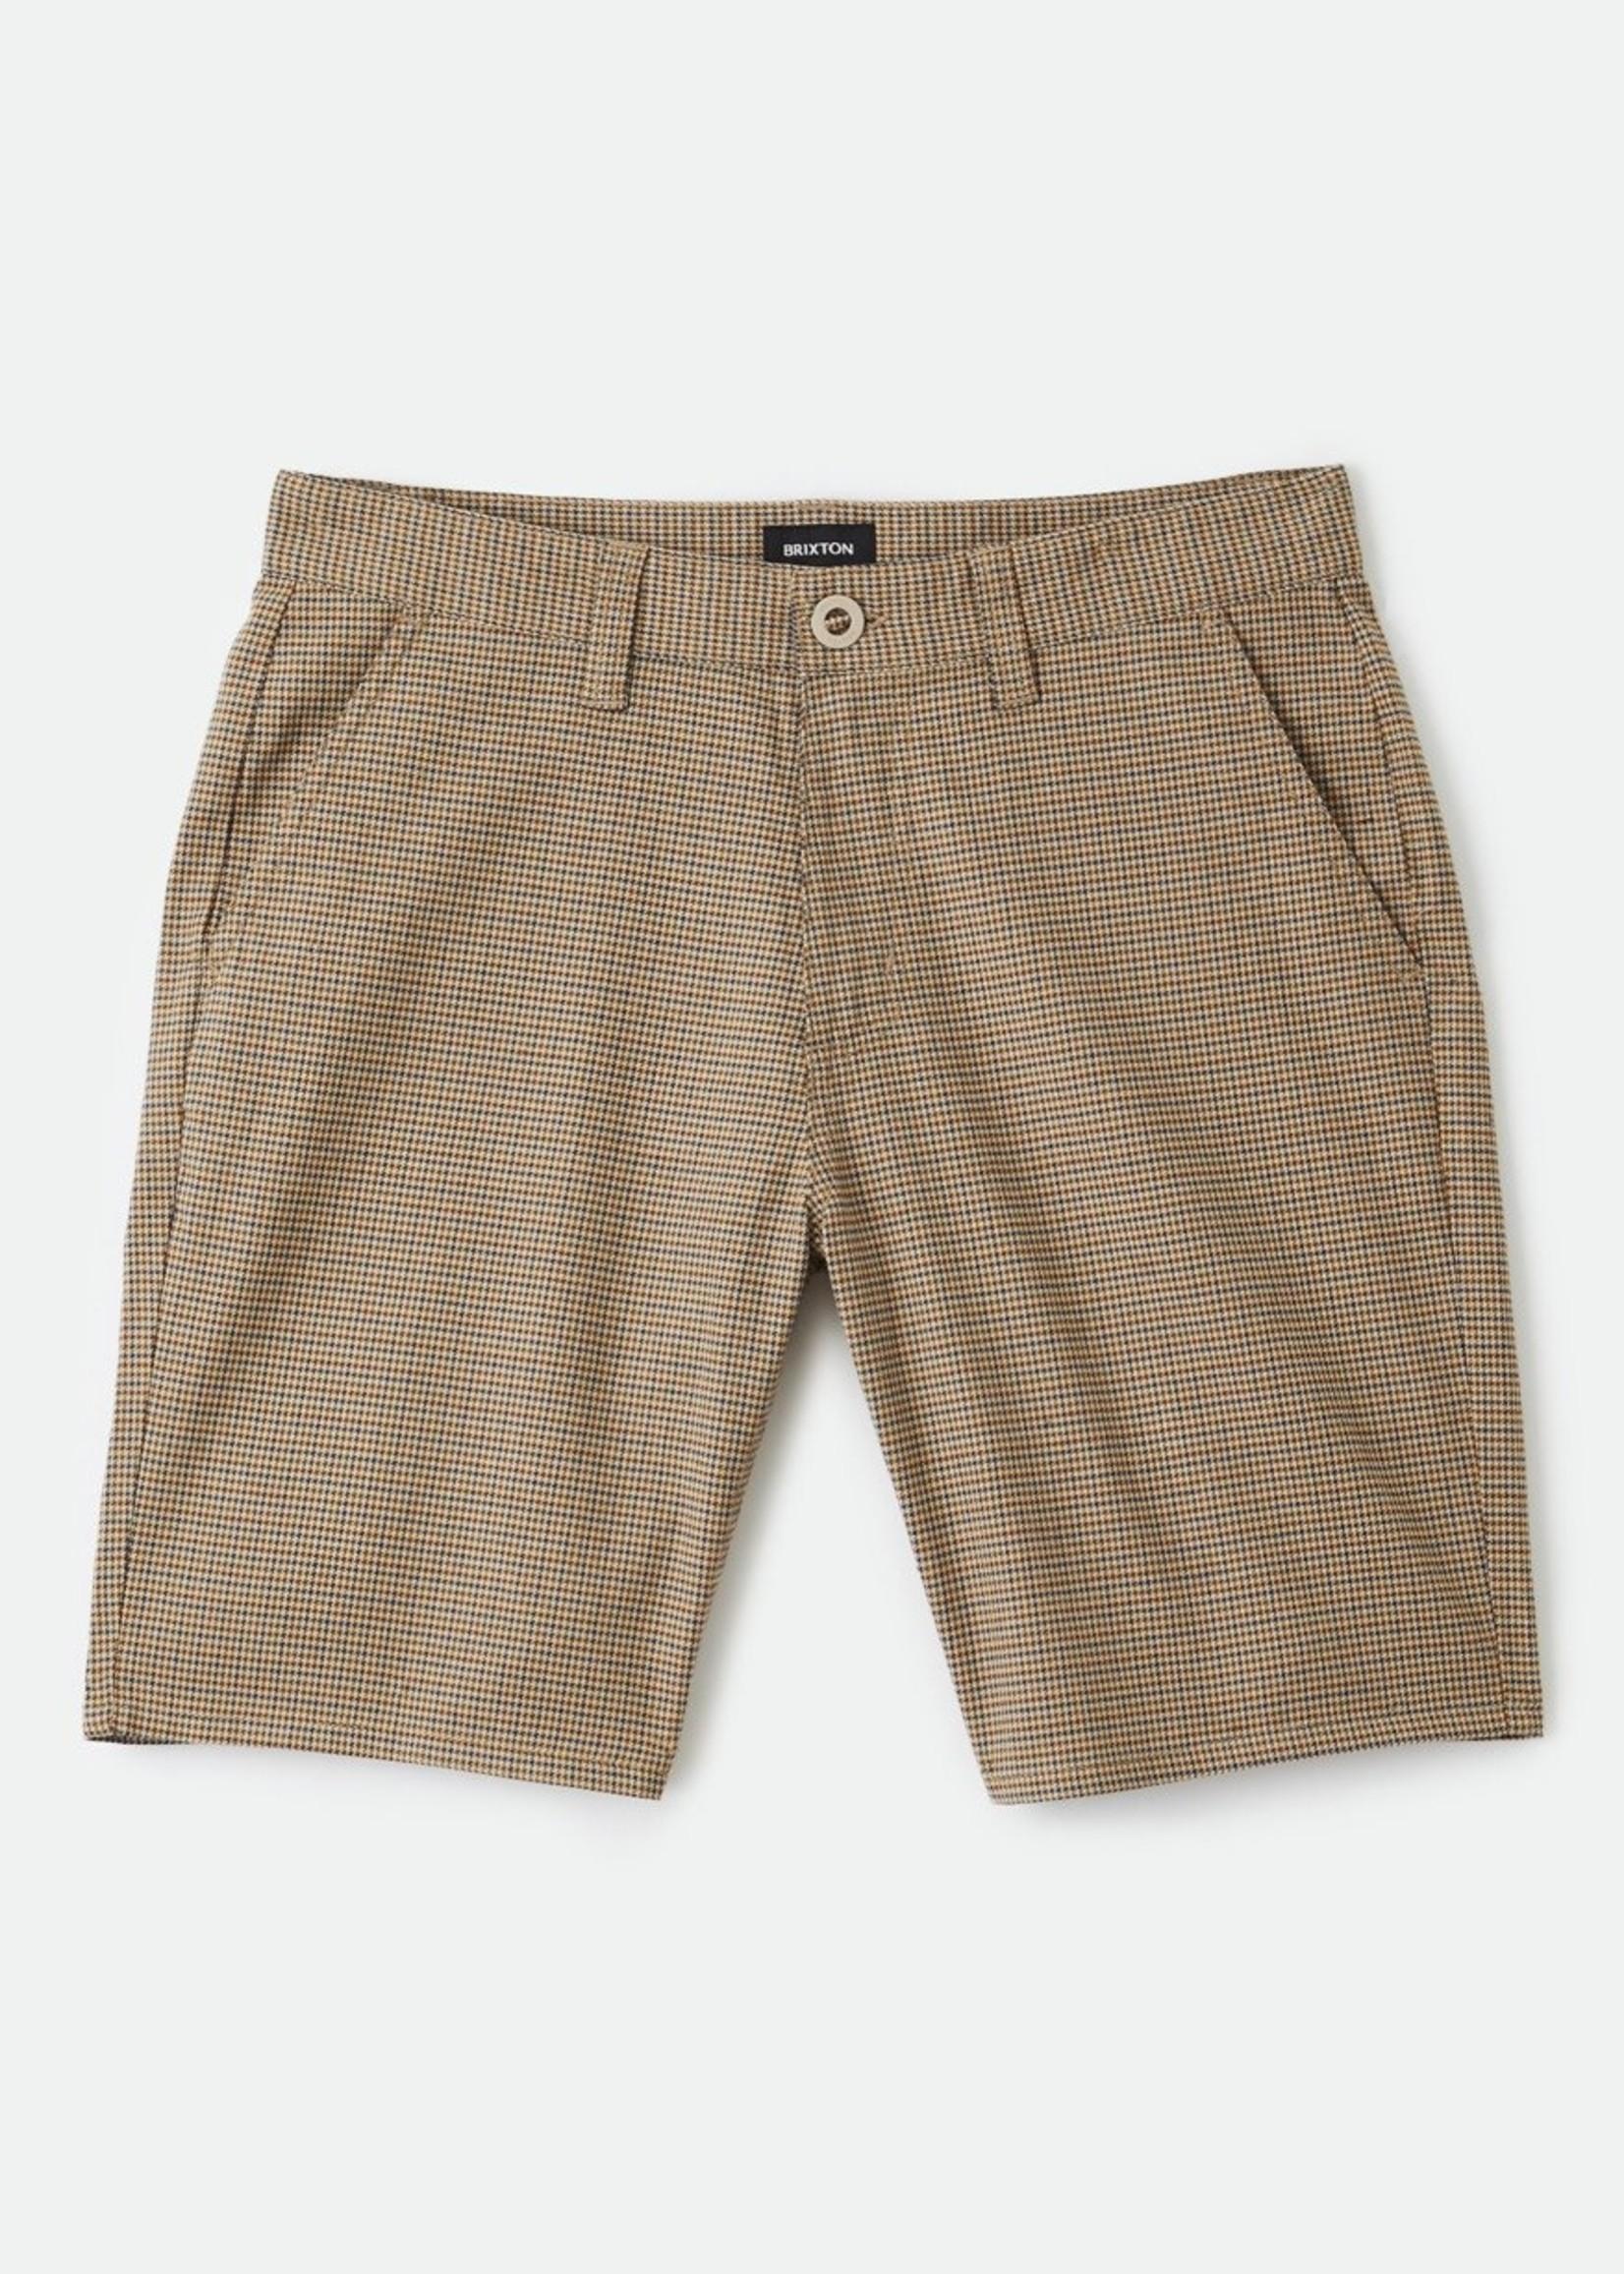 BRIXTON Choice Chino Short